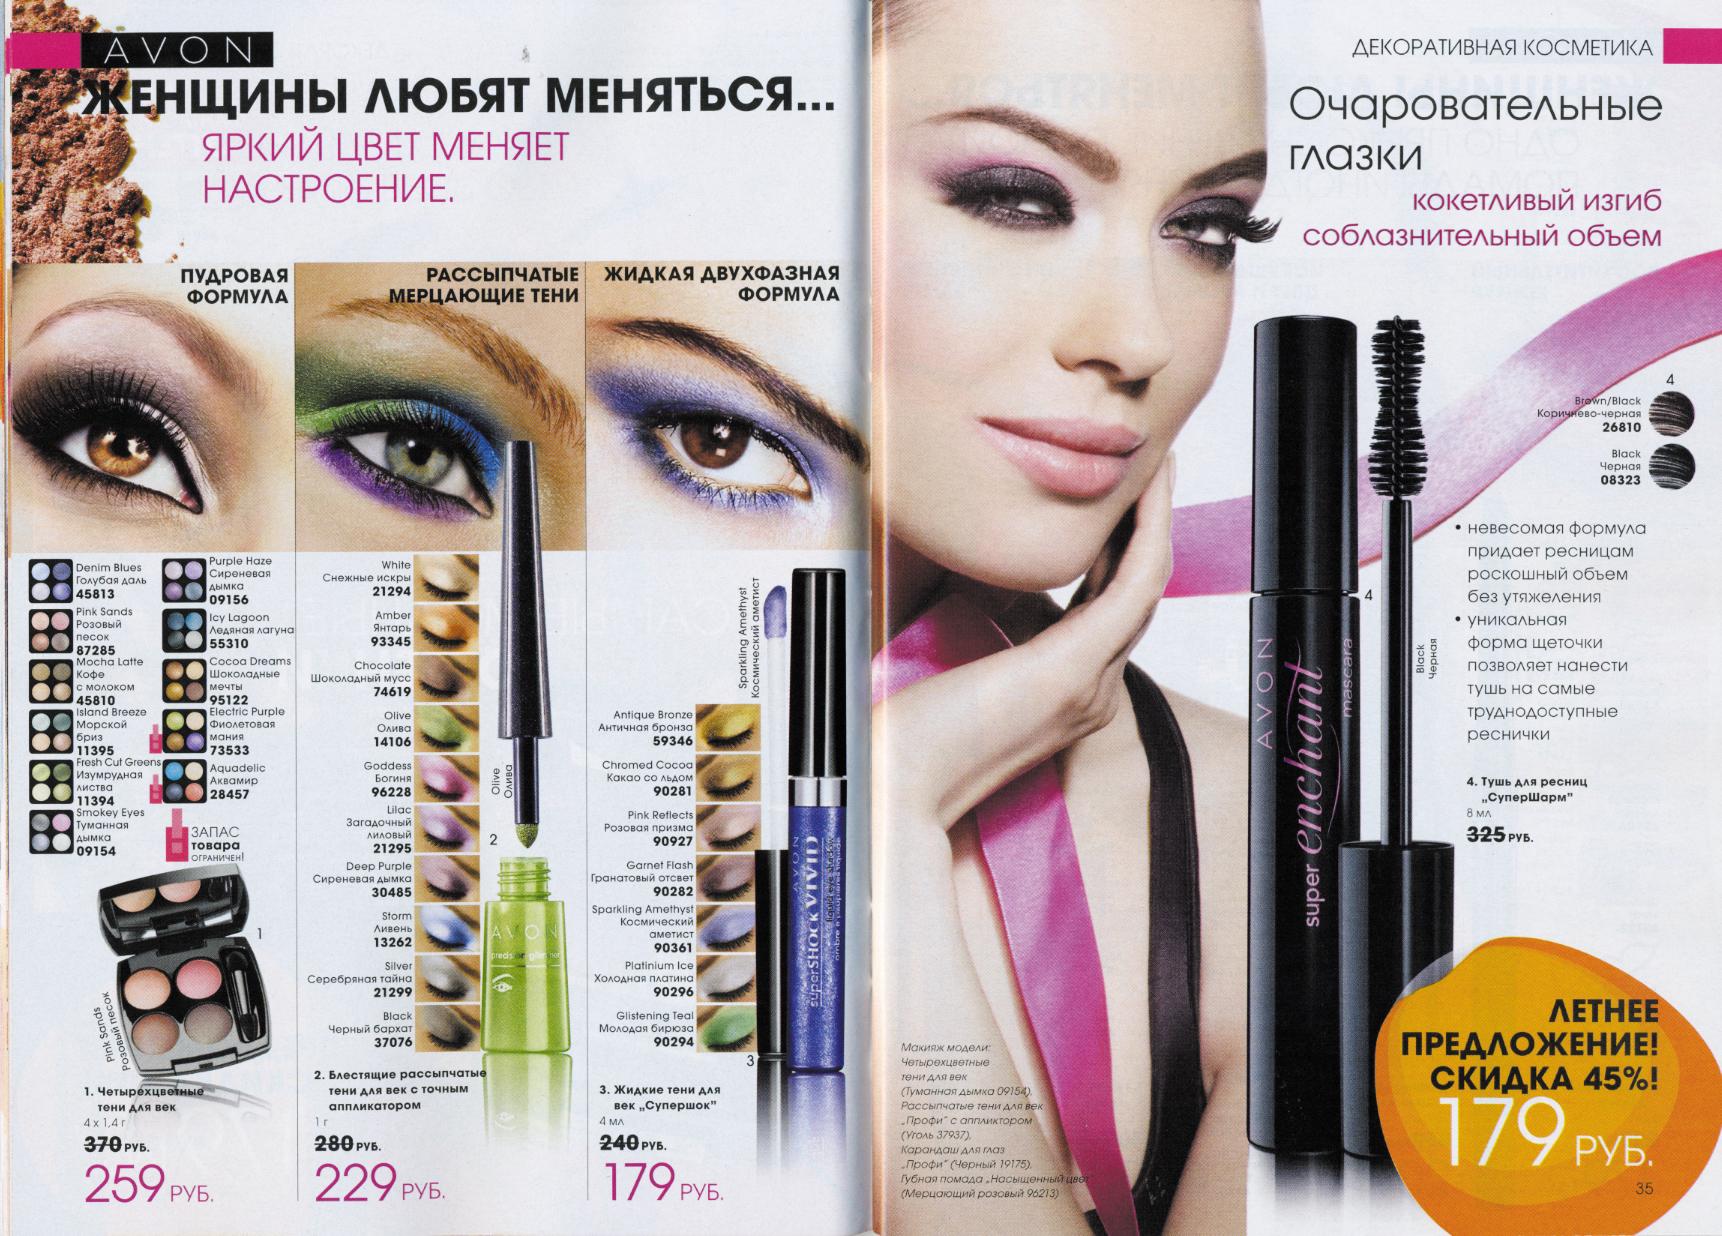 Avon каталог 2013 11 купить косметику герлен интернет магазин